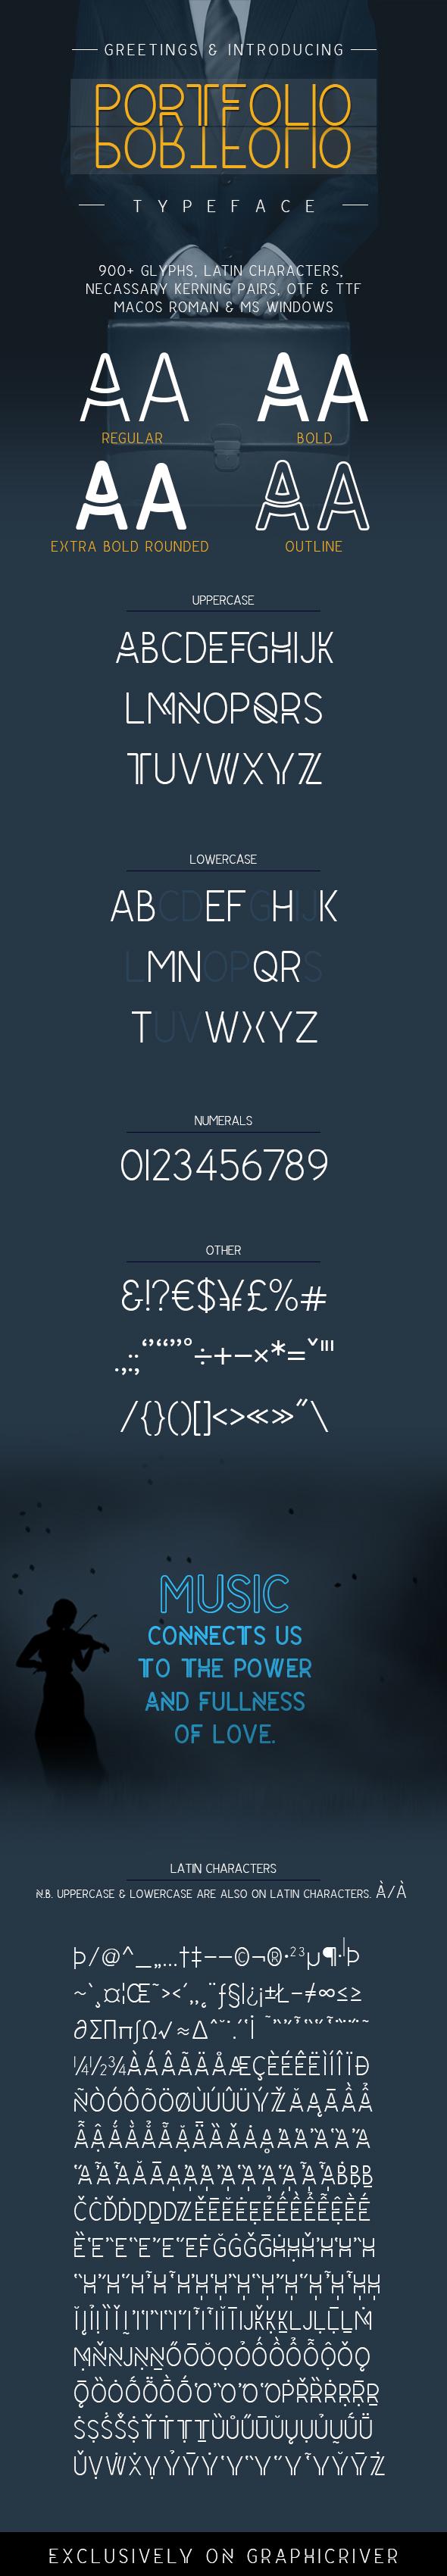 Portfolio - Monospaced Sans-Serif